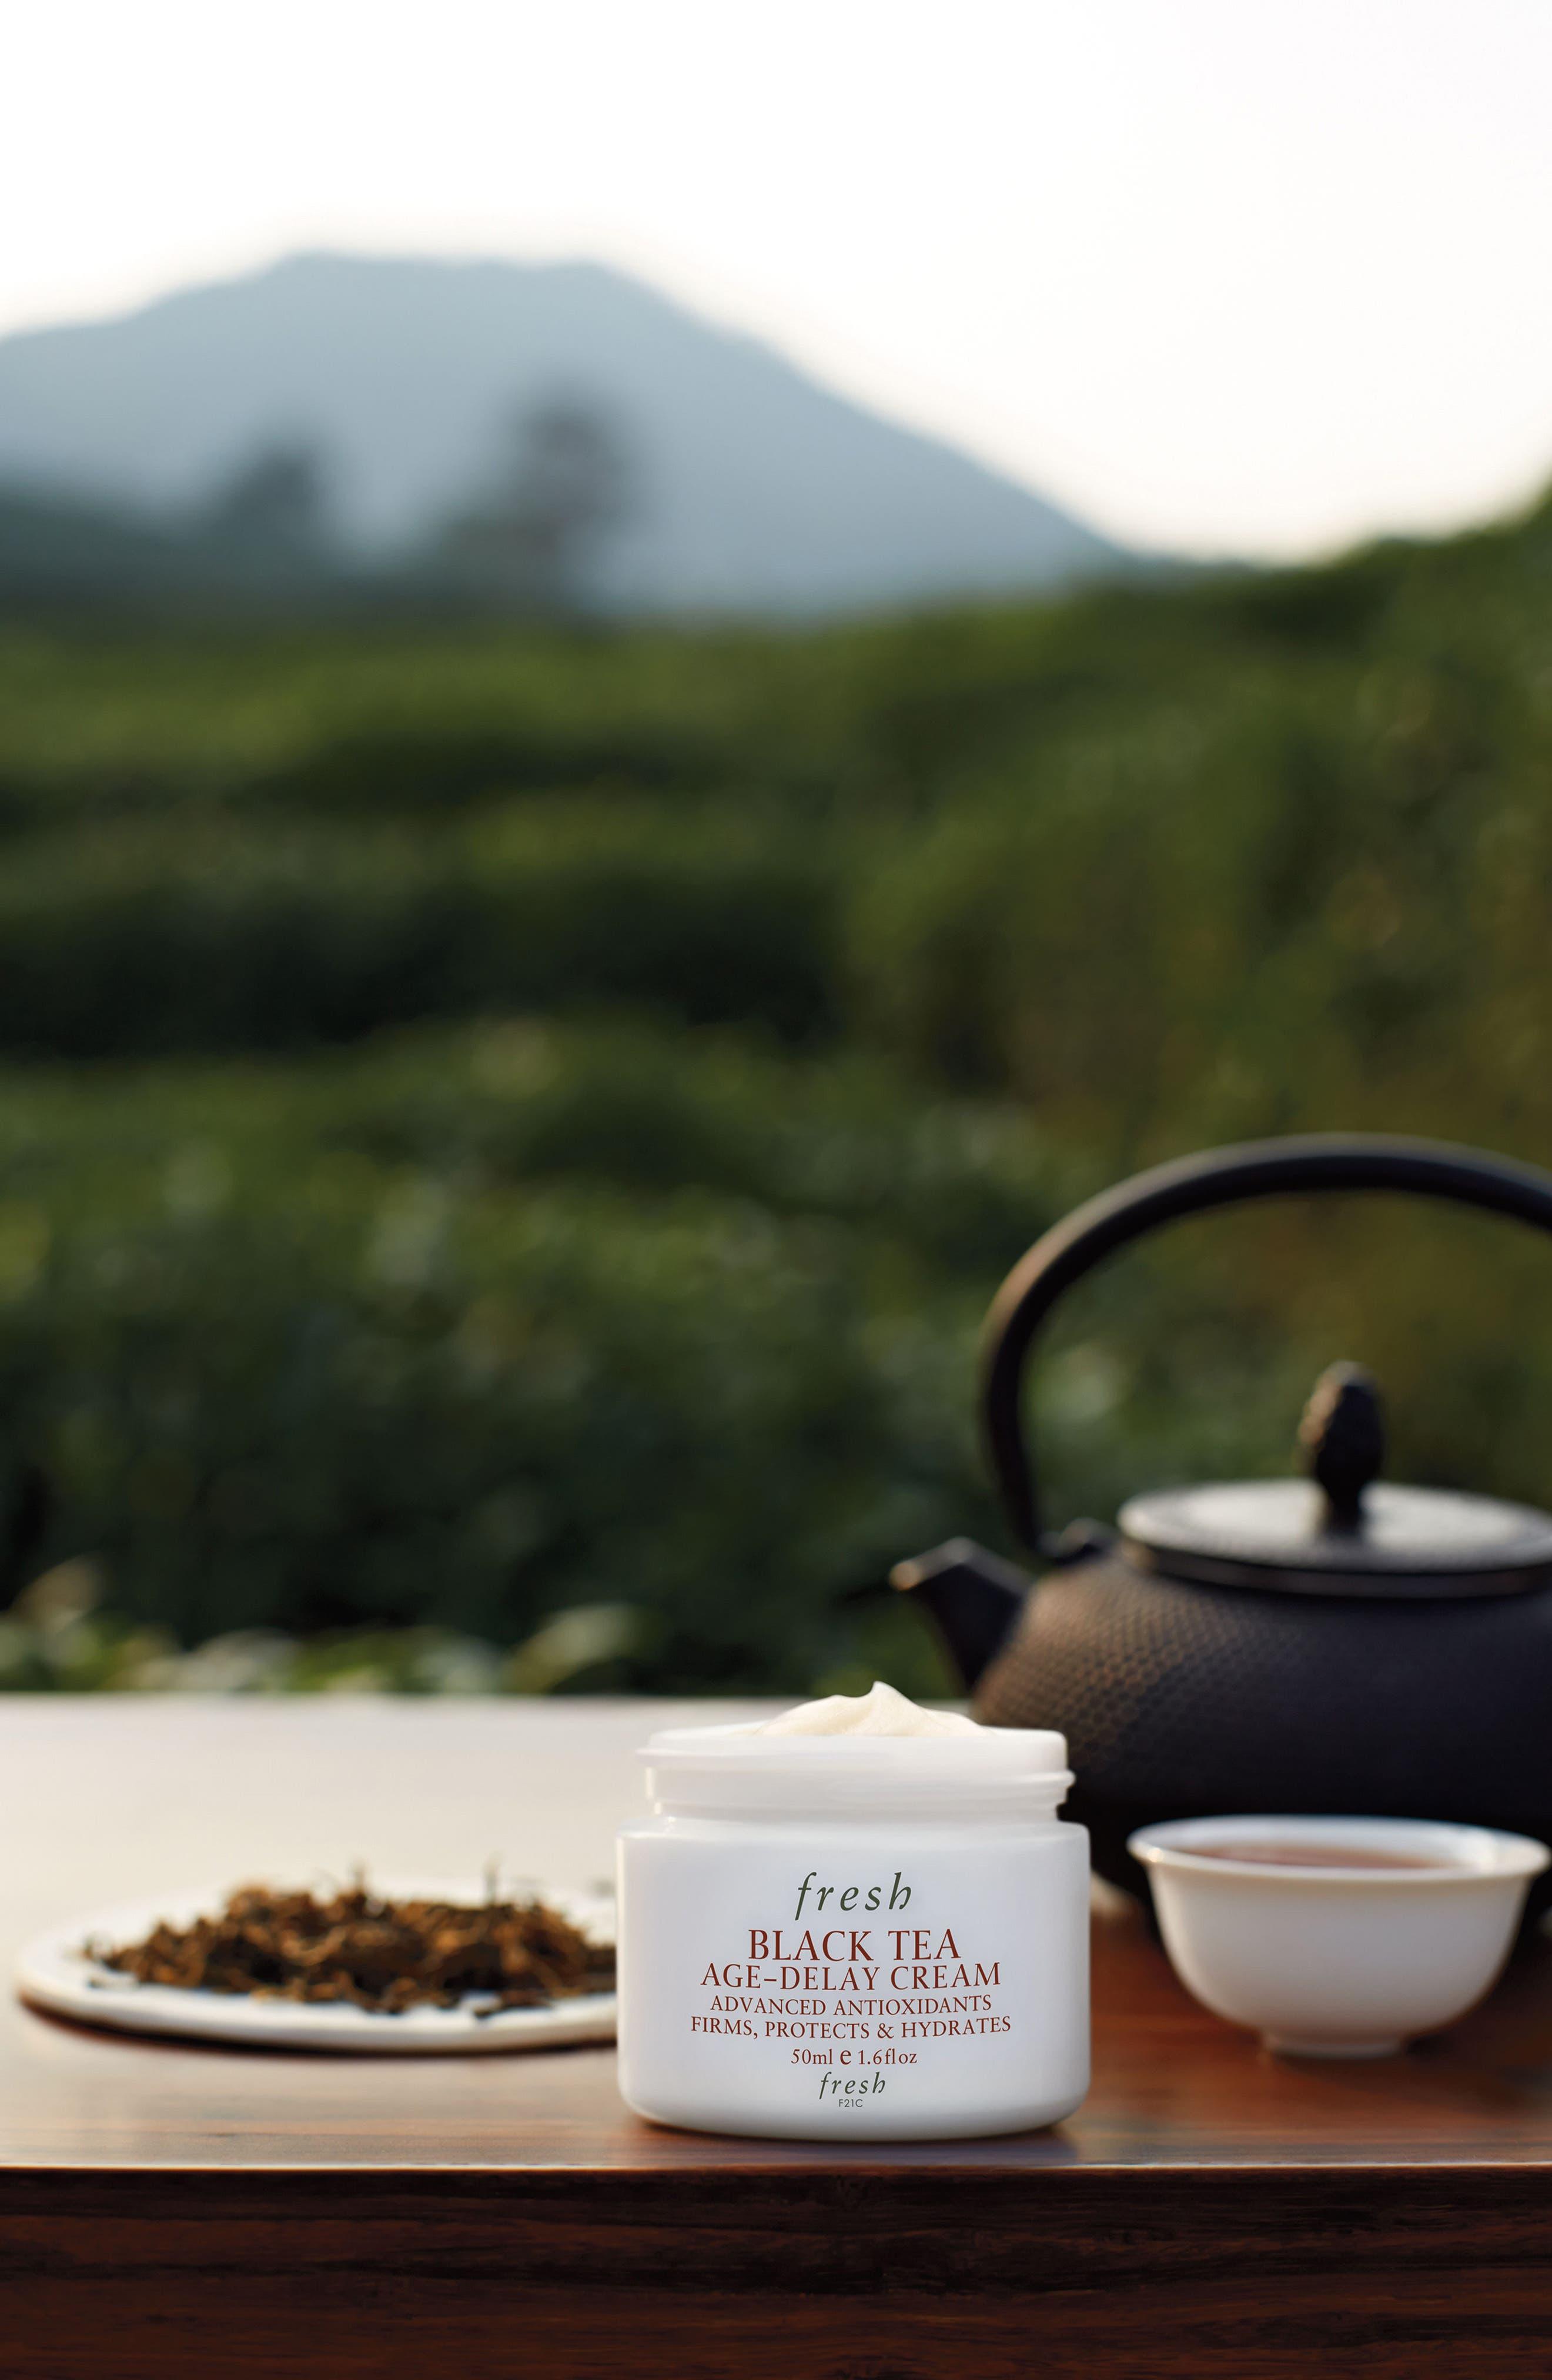 Black Tea Age-Delay Cream,                             Alternate thumbnail 2, color,                             NO COLOR